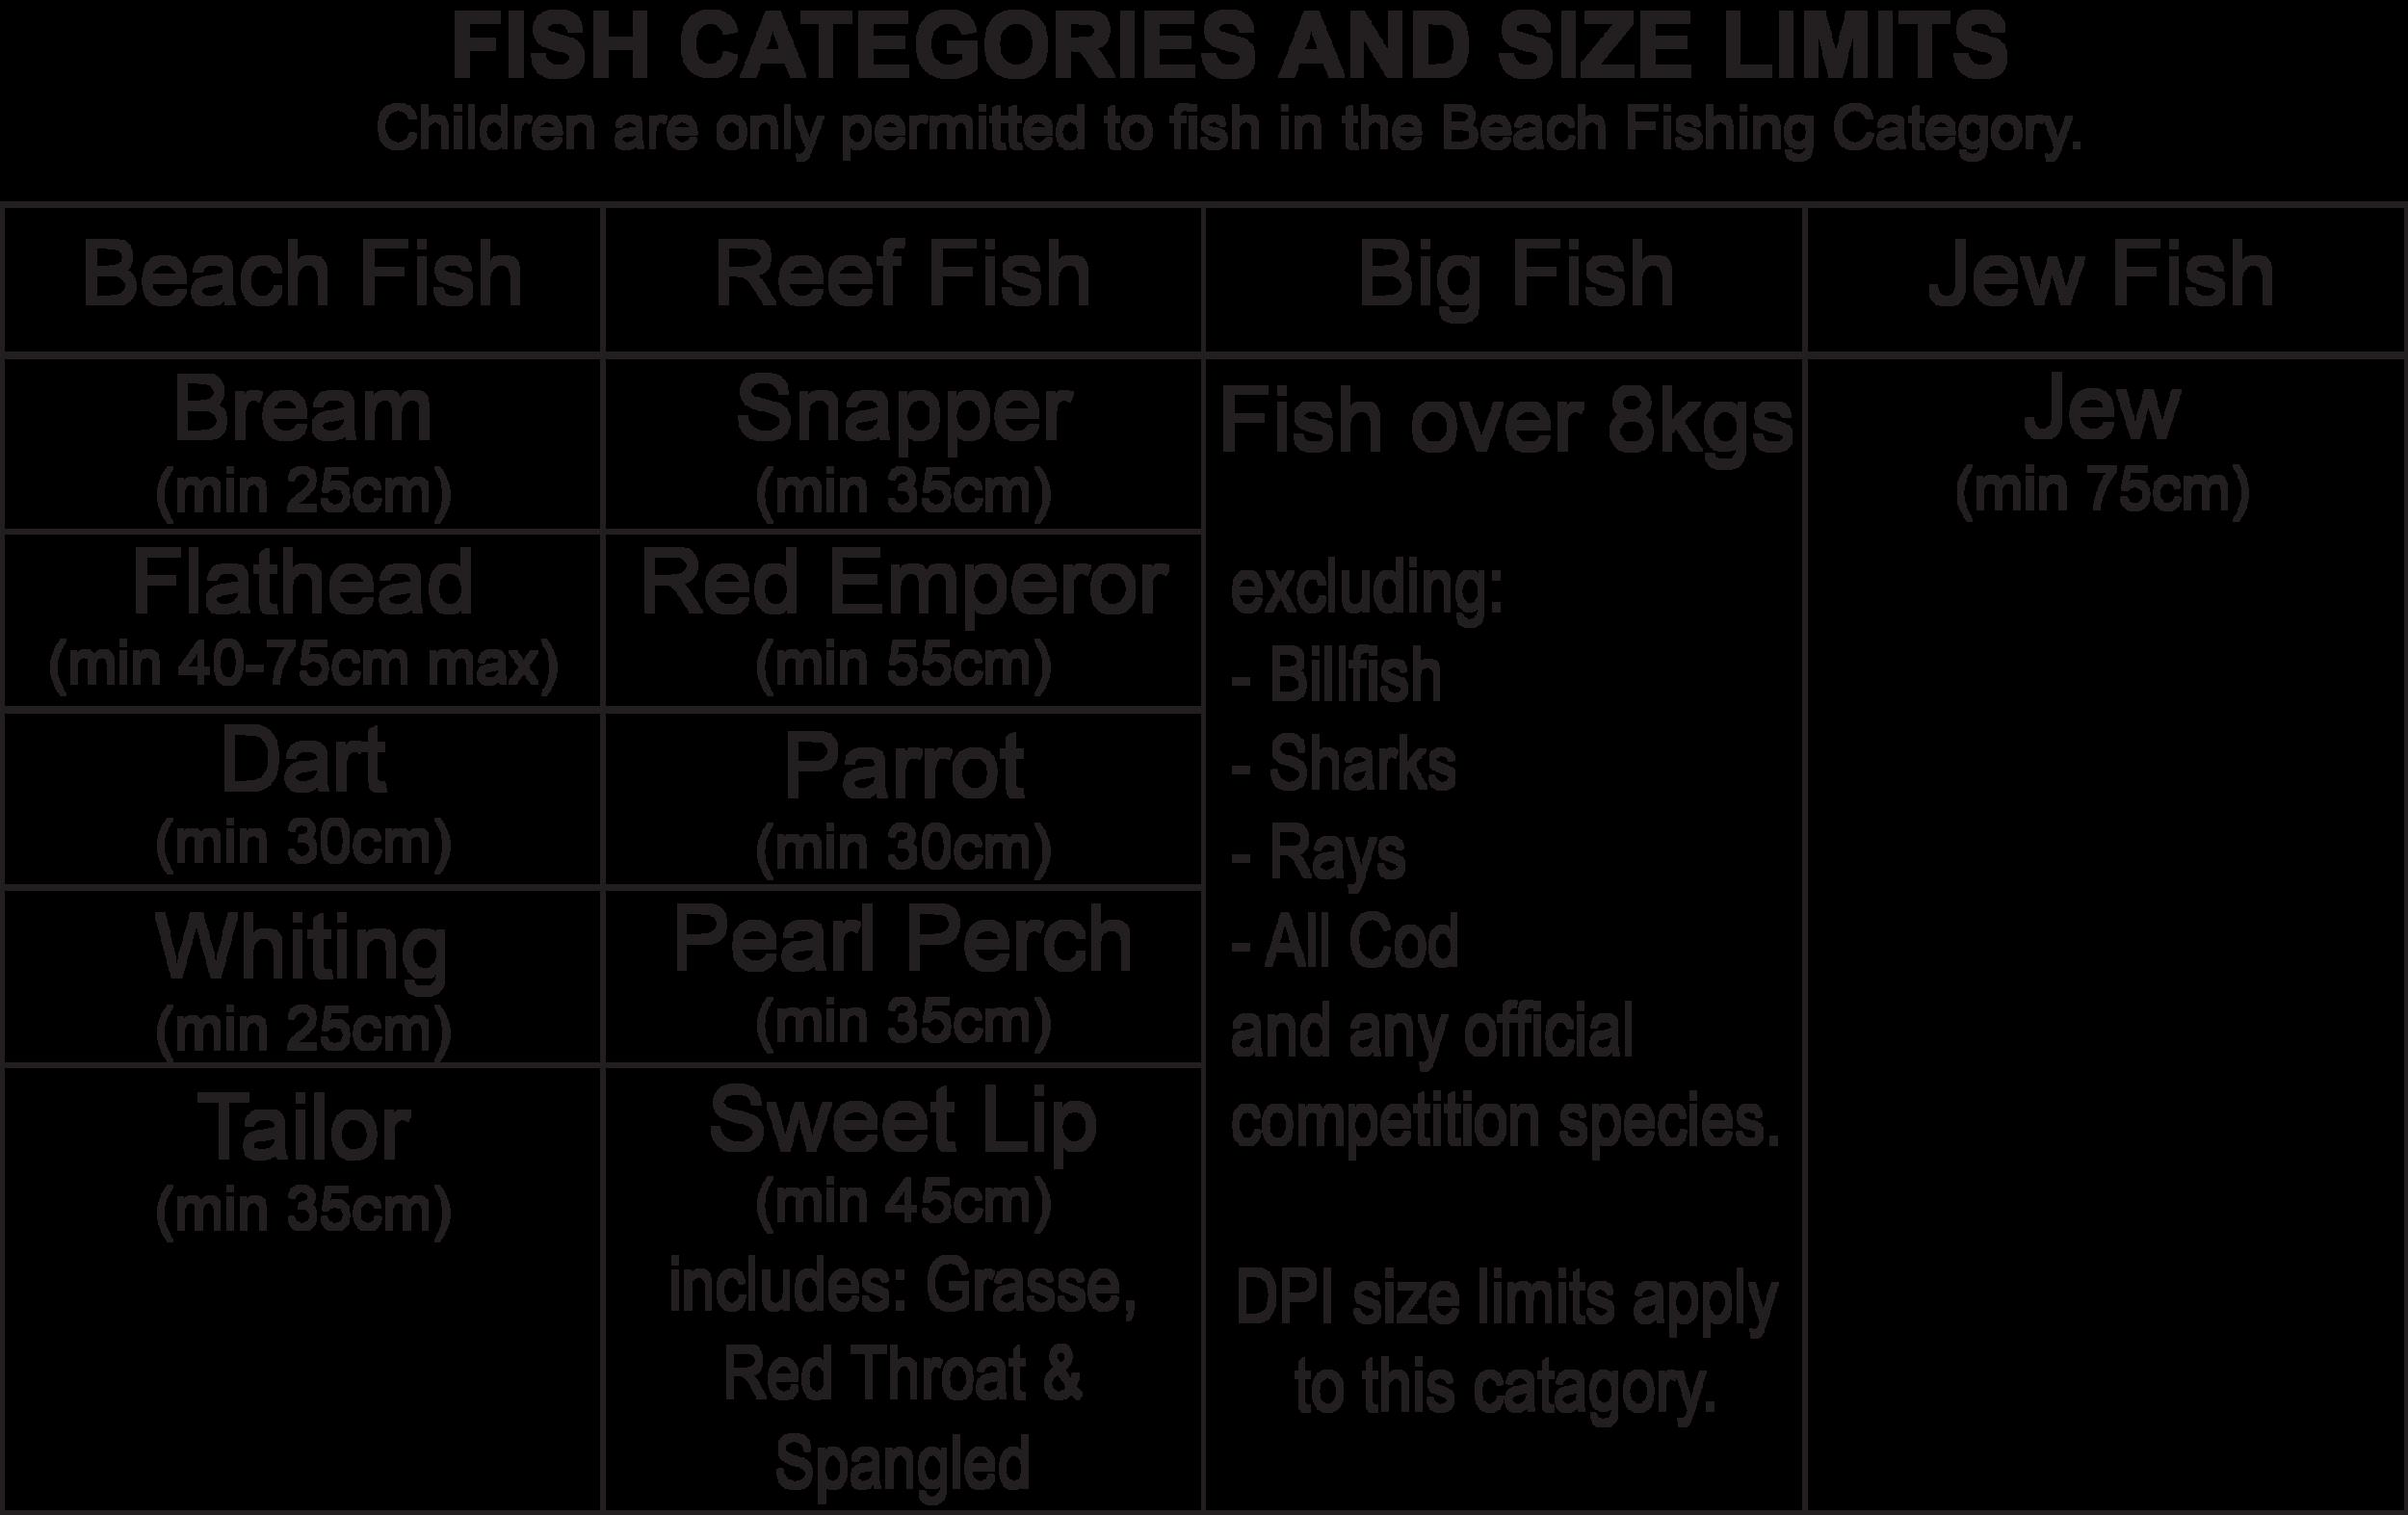 Fish Categories & Size Limits